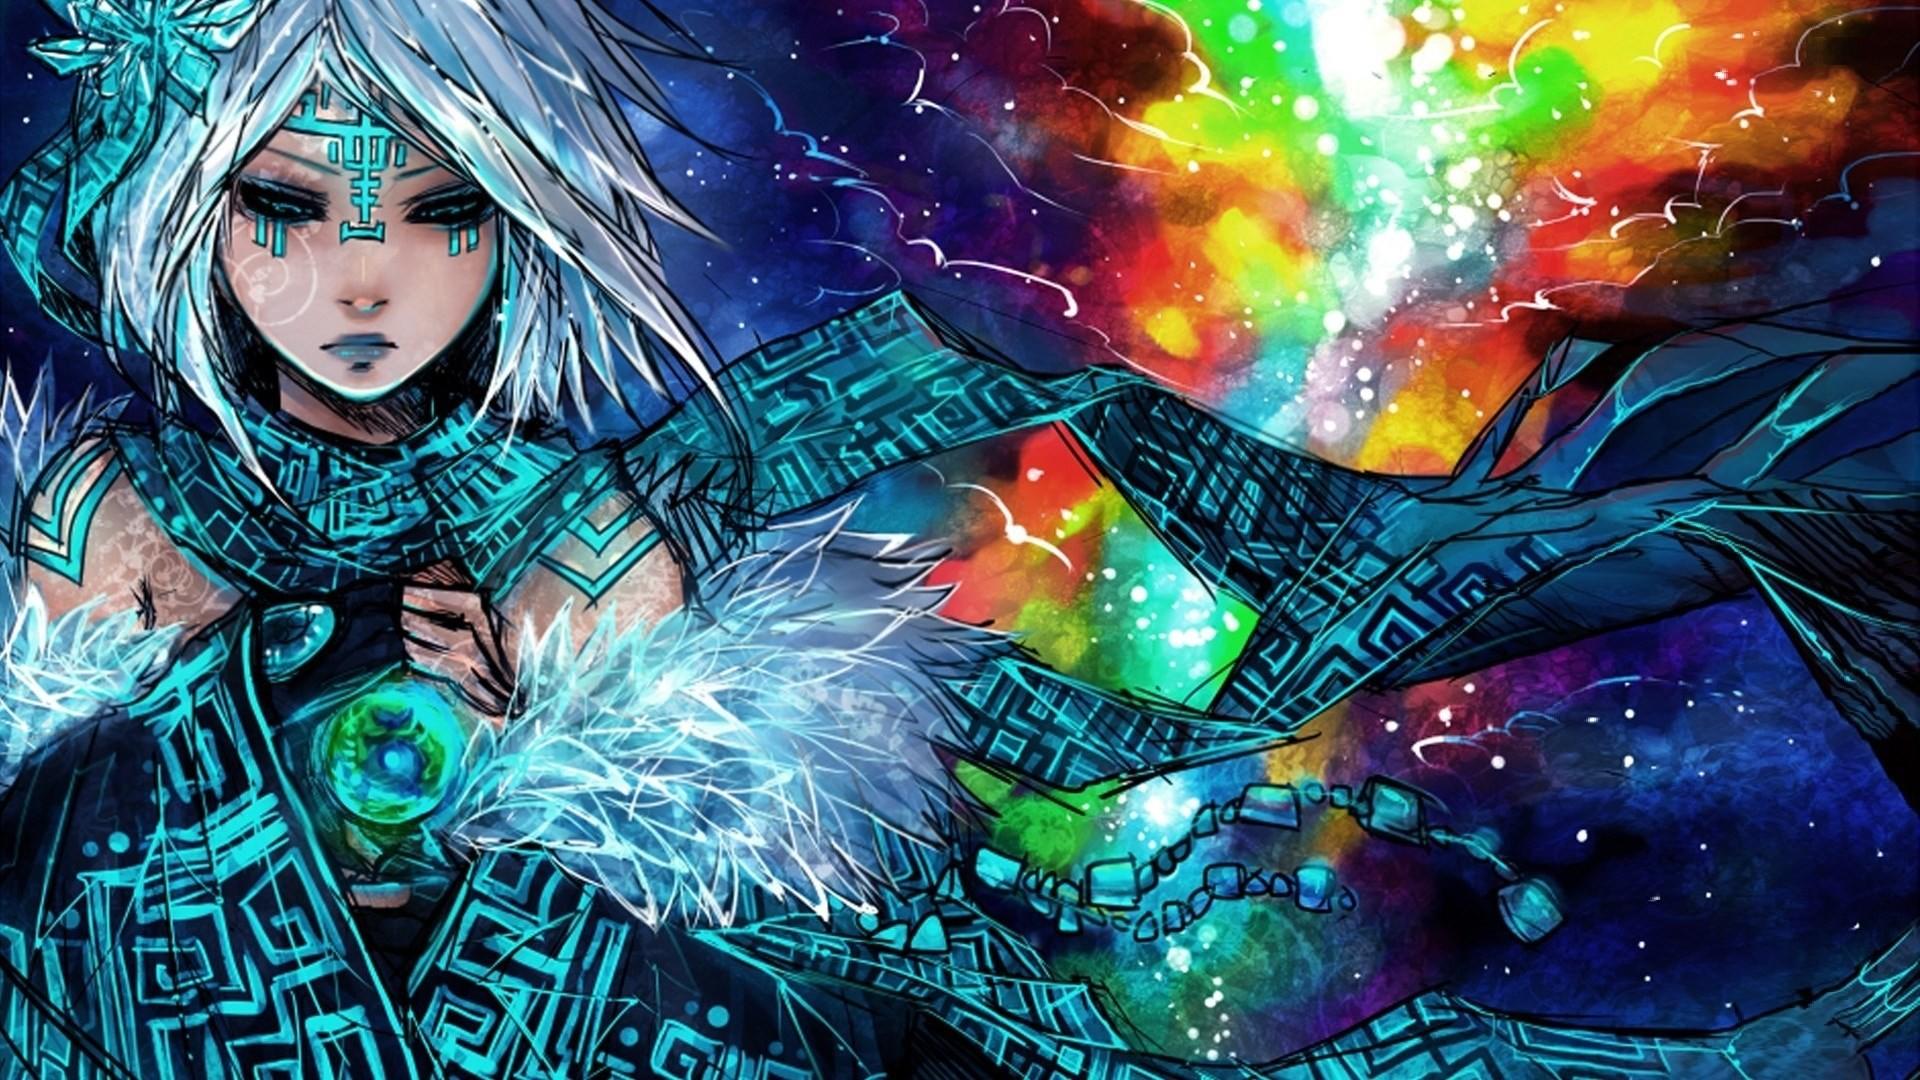 tribal mage hd anime wallpaper